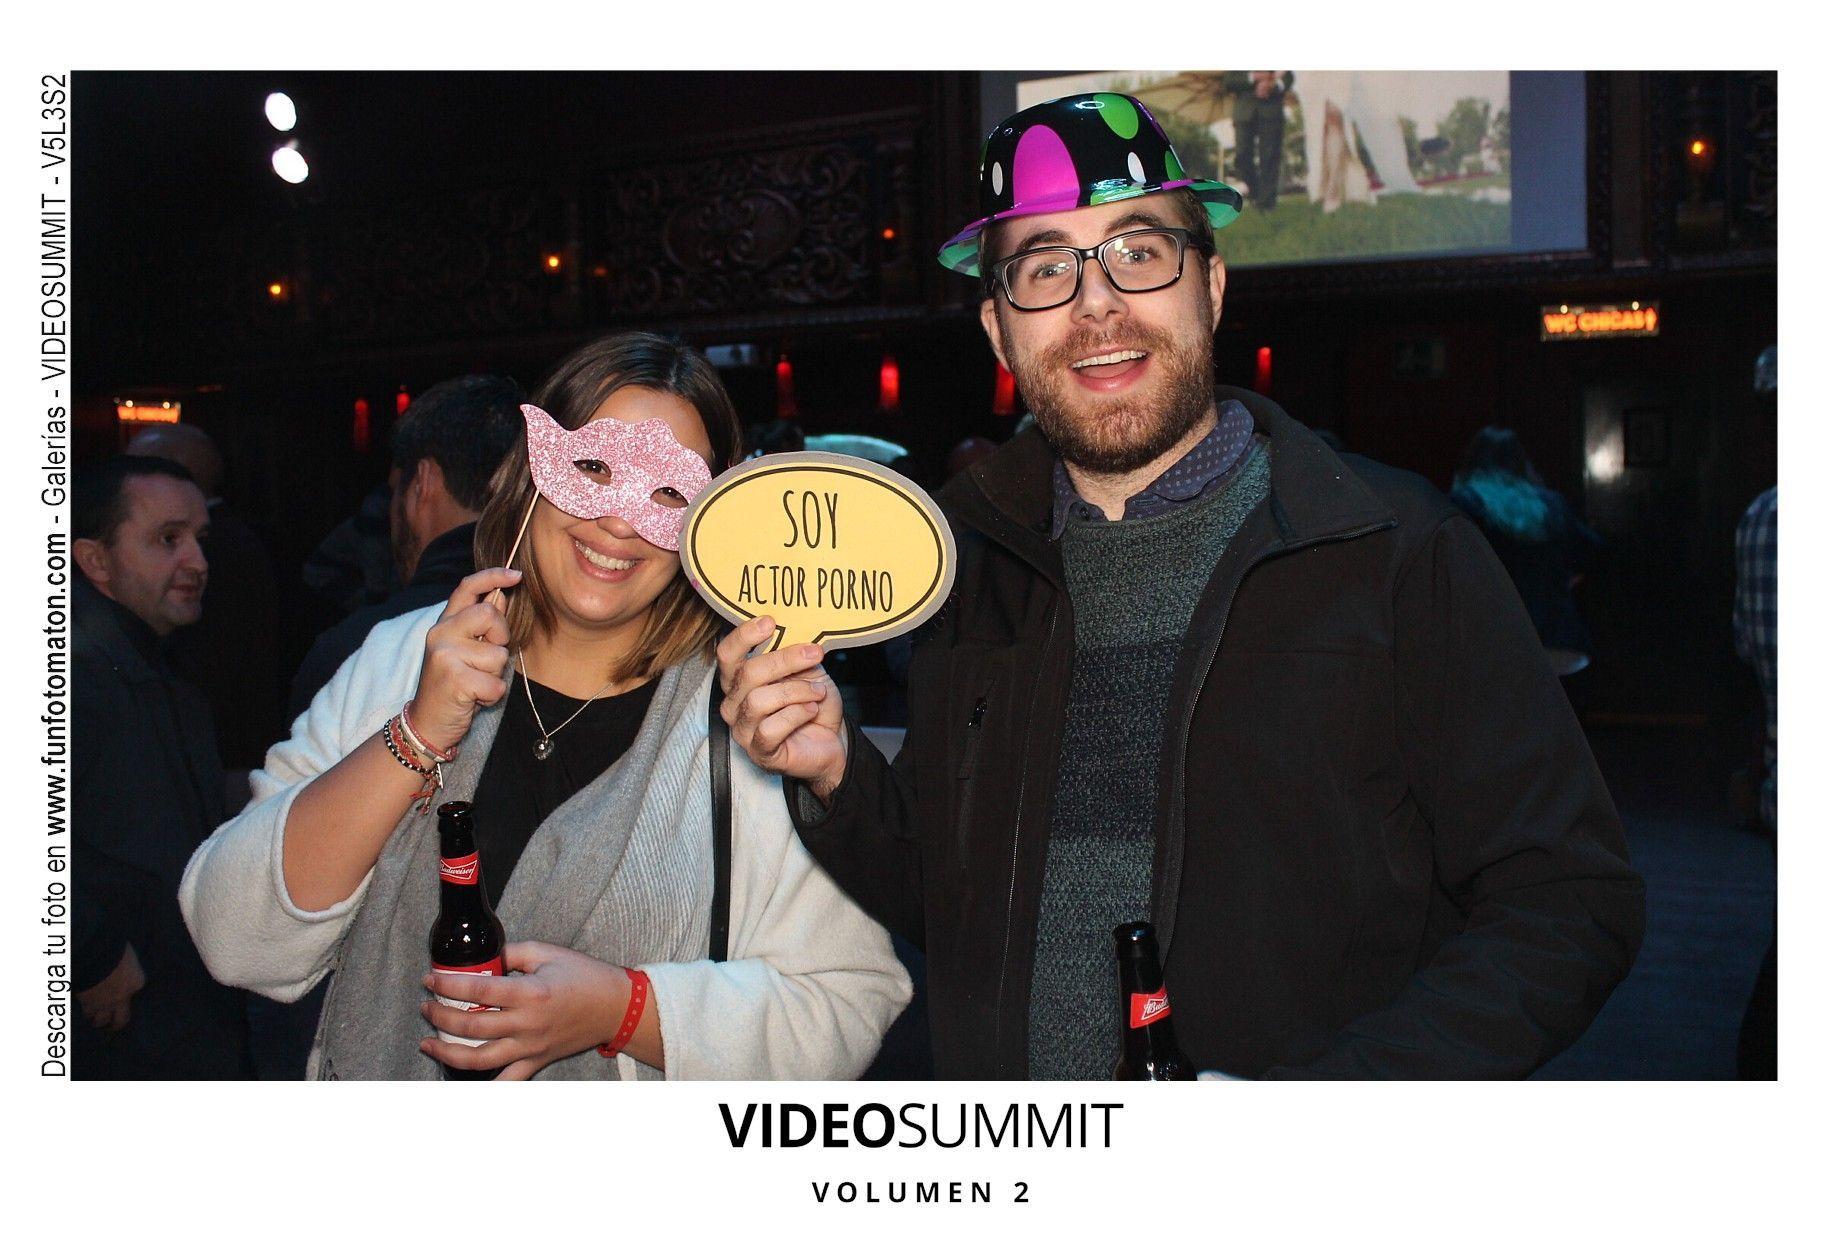 videosummit-vol2-club-party-063